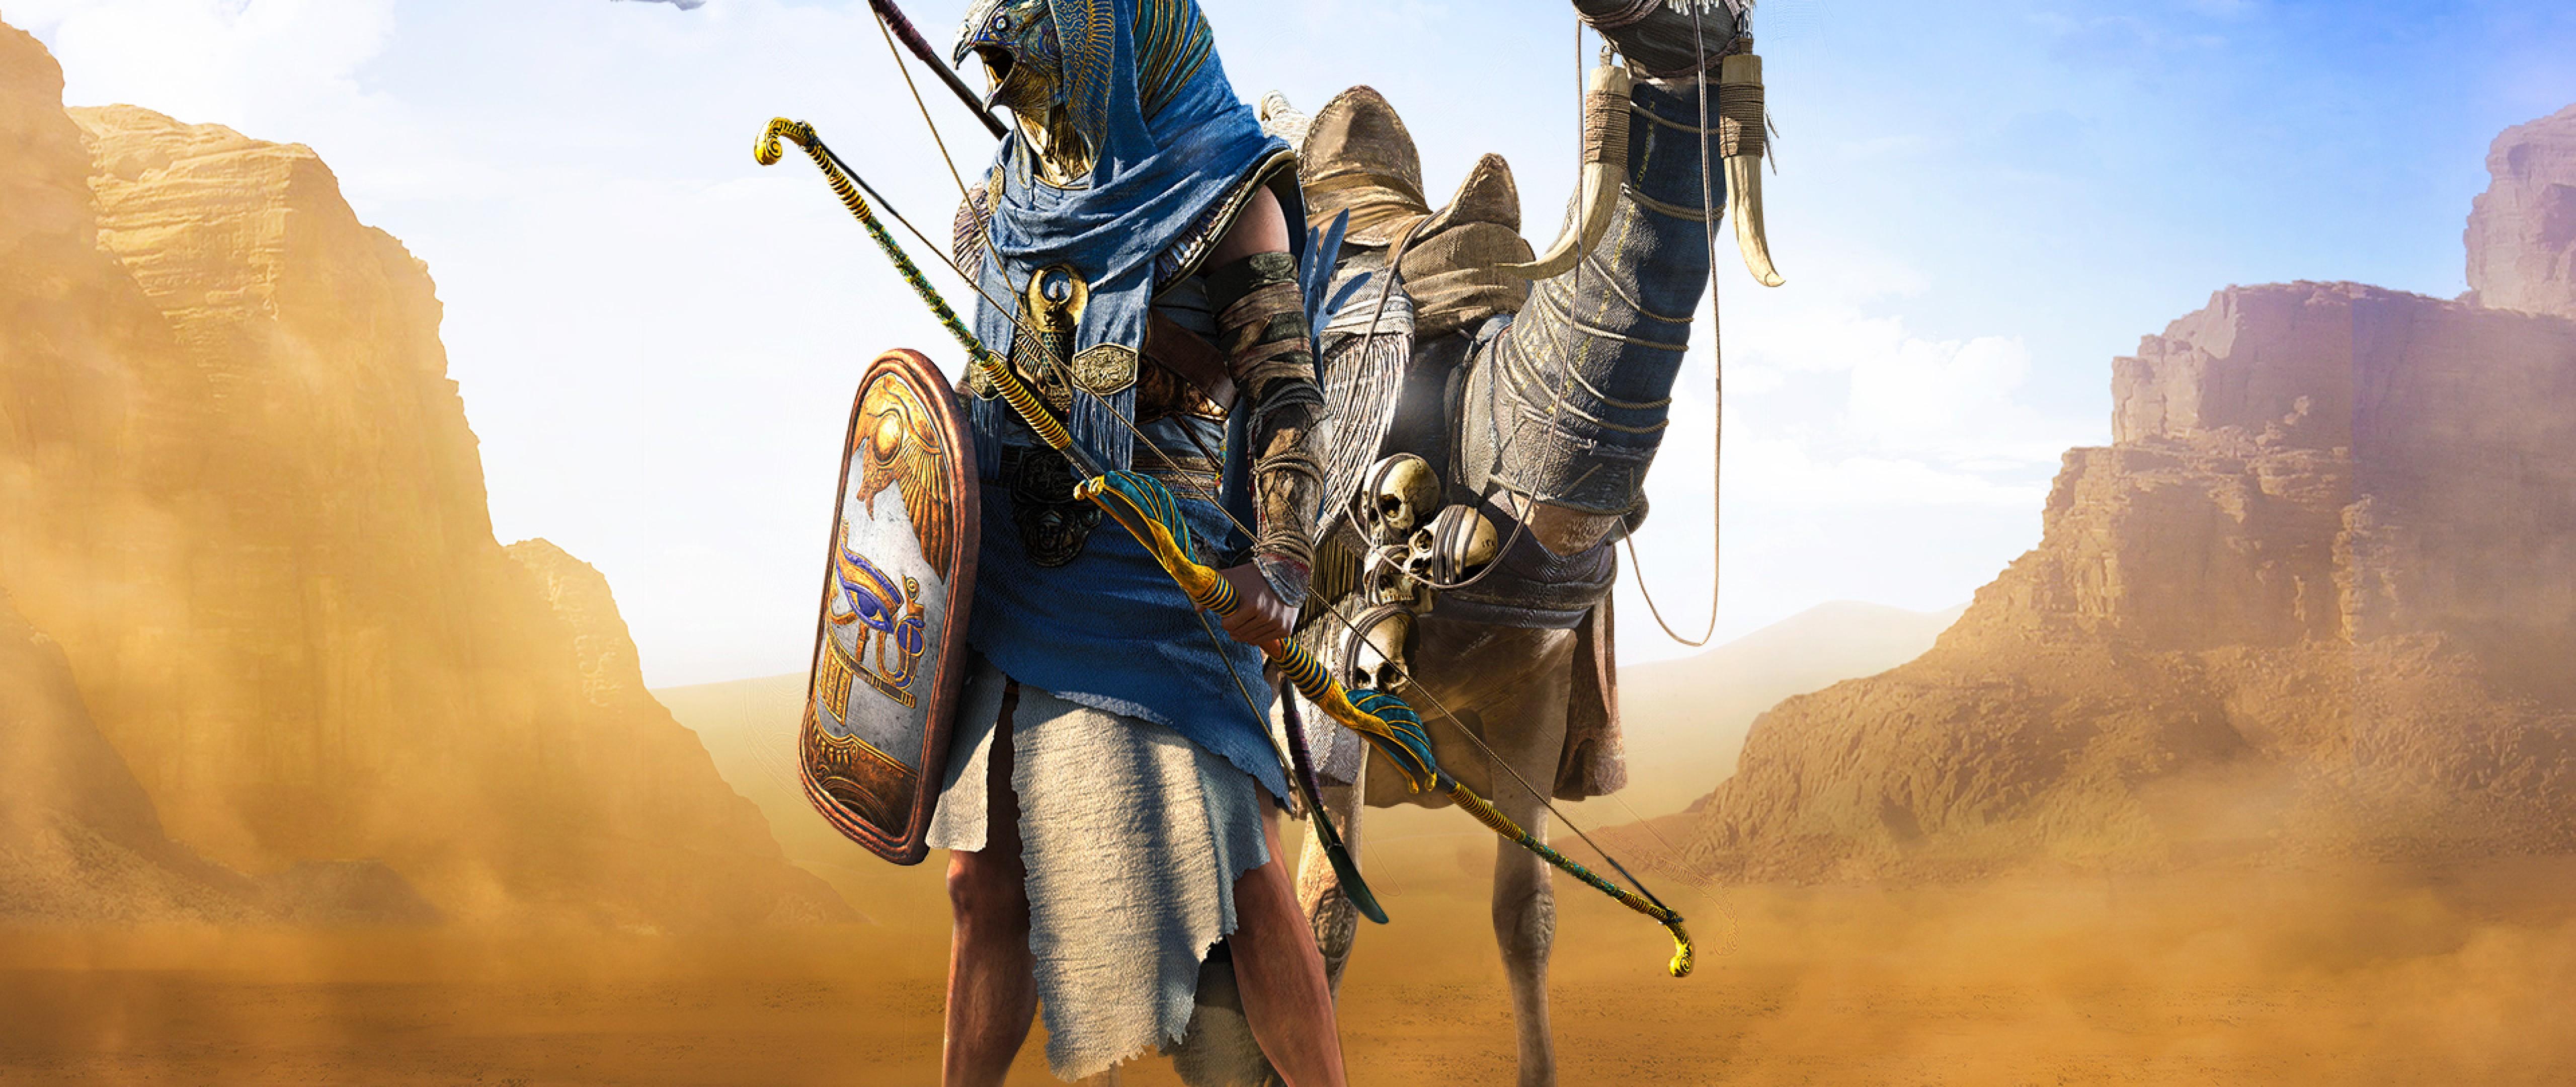 Assassin S Creed Origins Hd Wallpaper For Desktop And Mobiles 4k